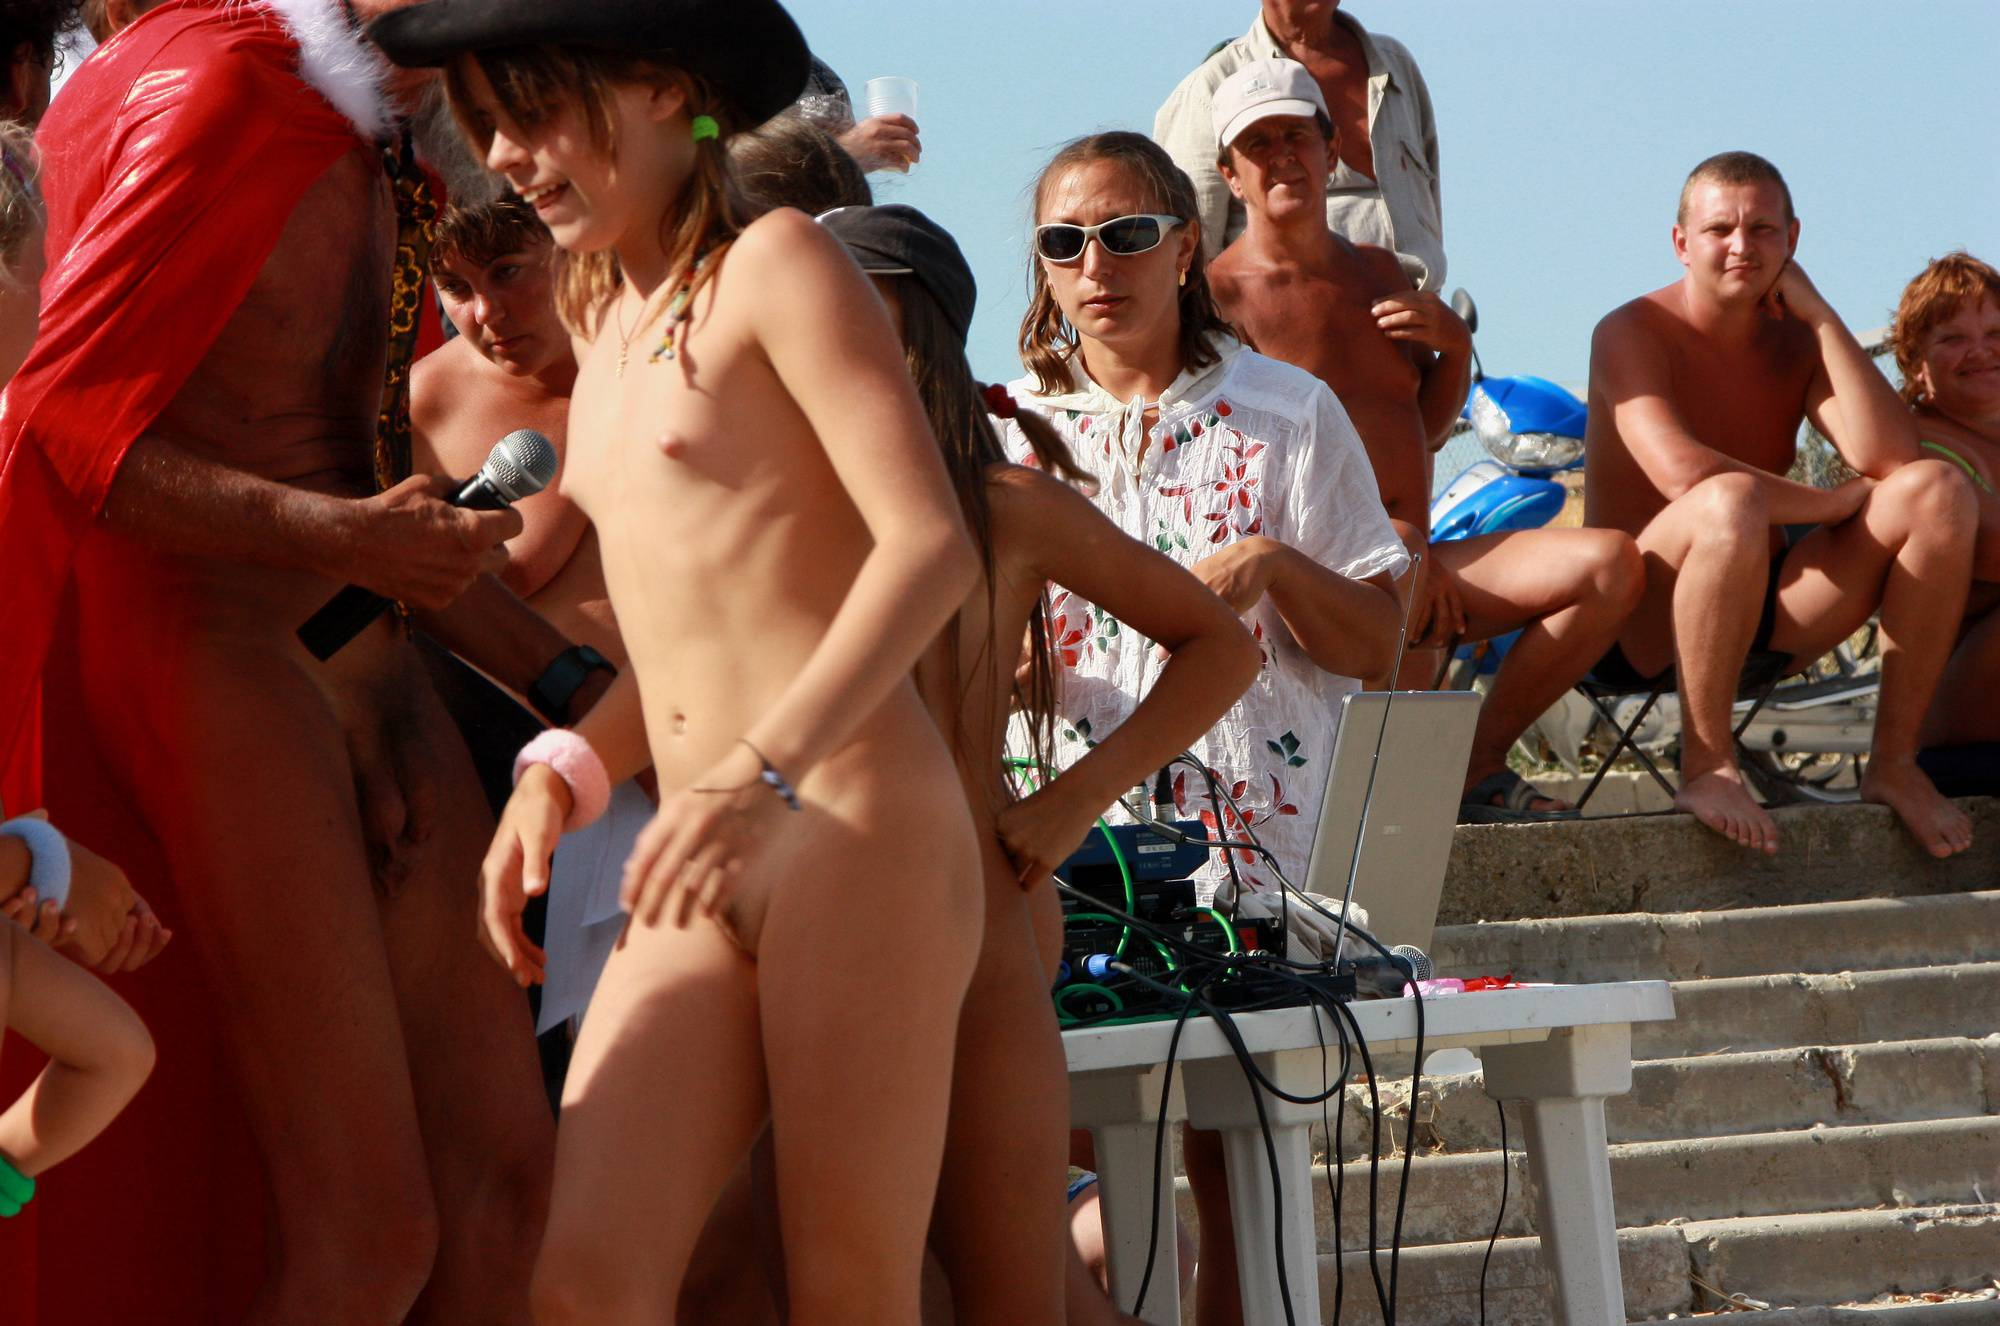 Nudist Pictures Naturist Duet Beach Dance - 2